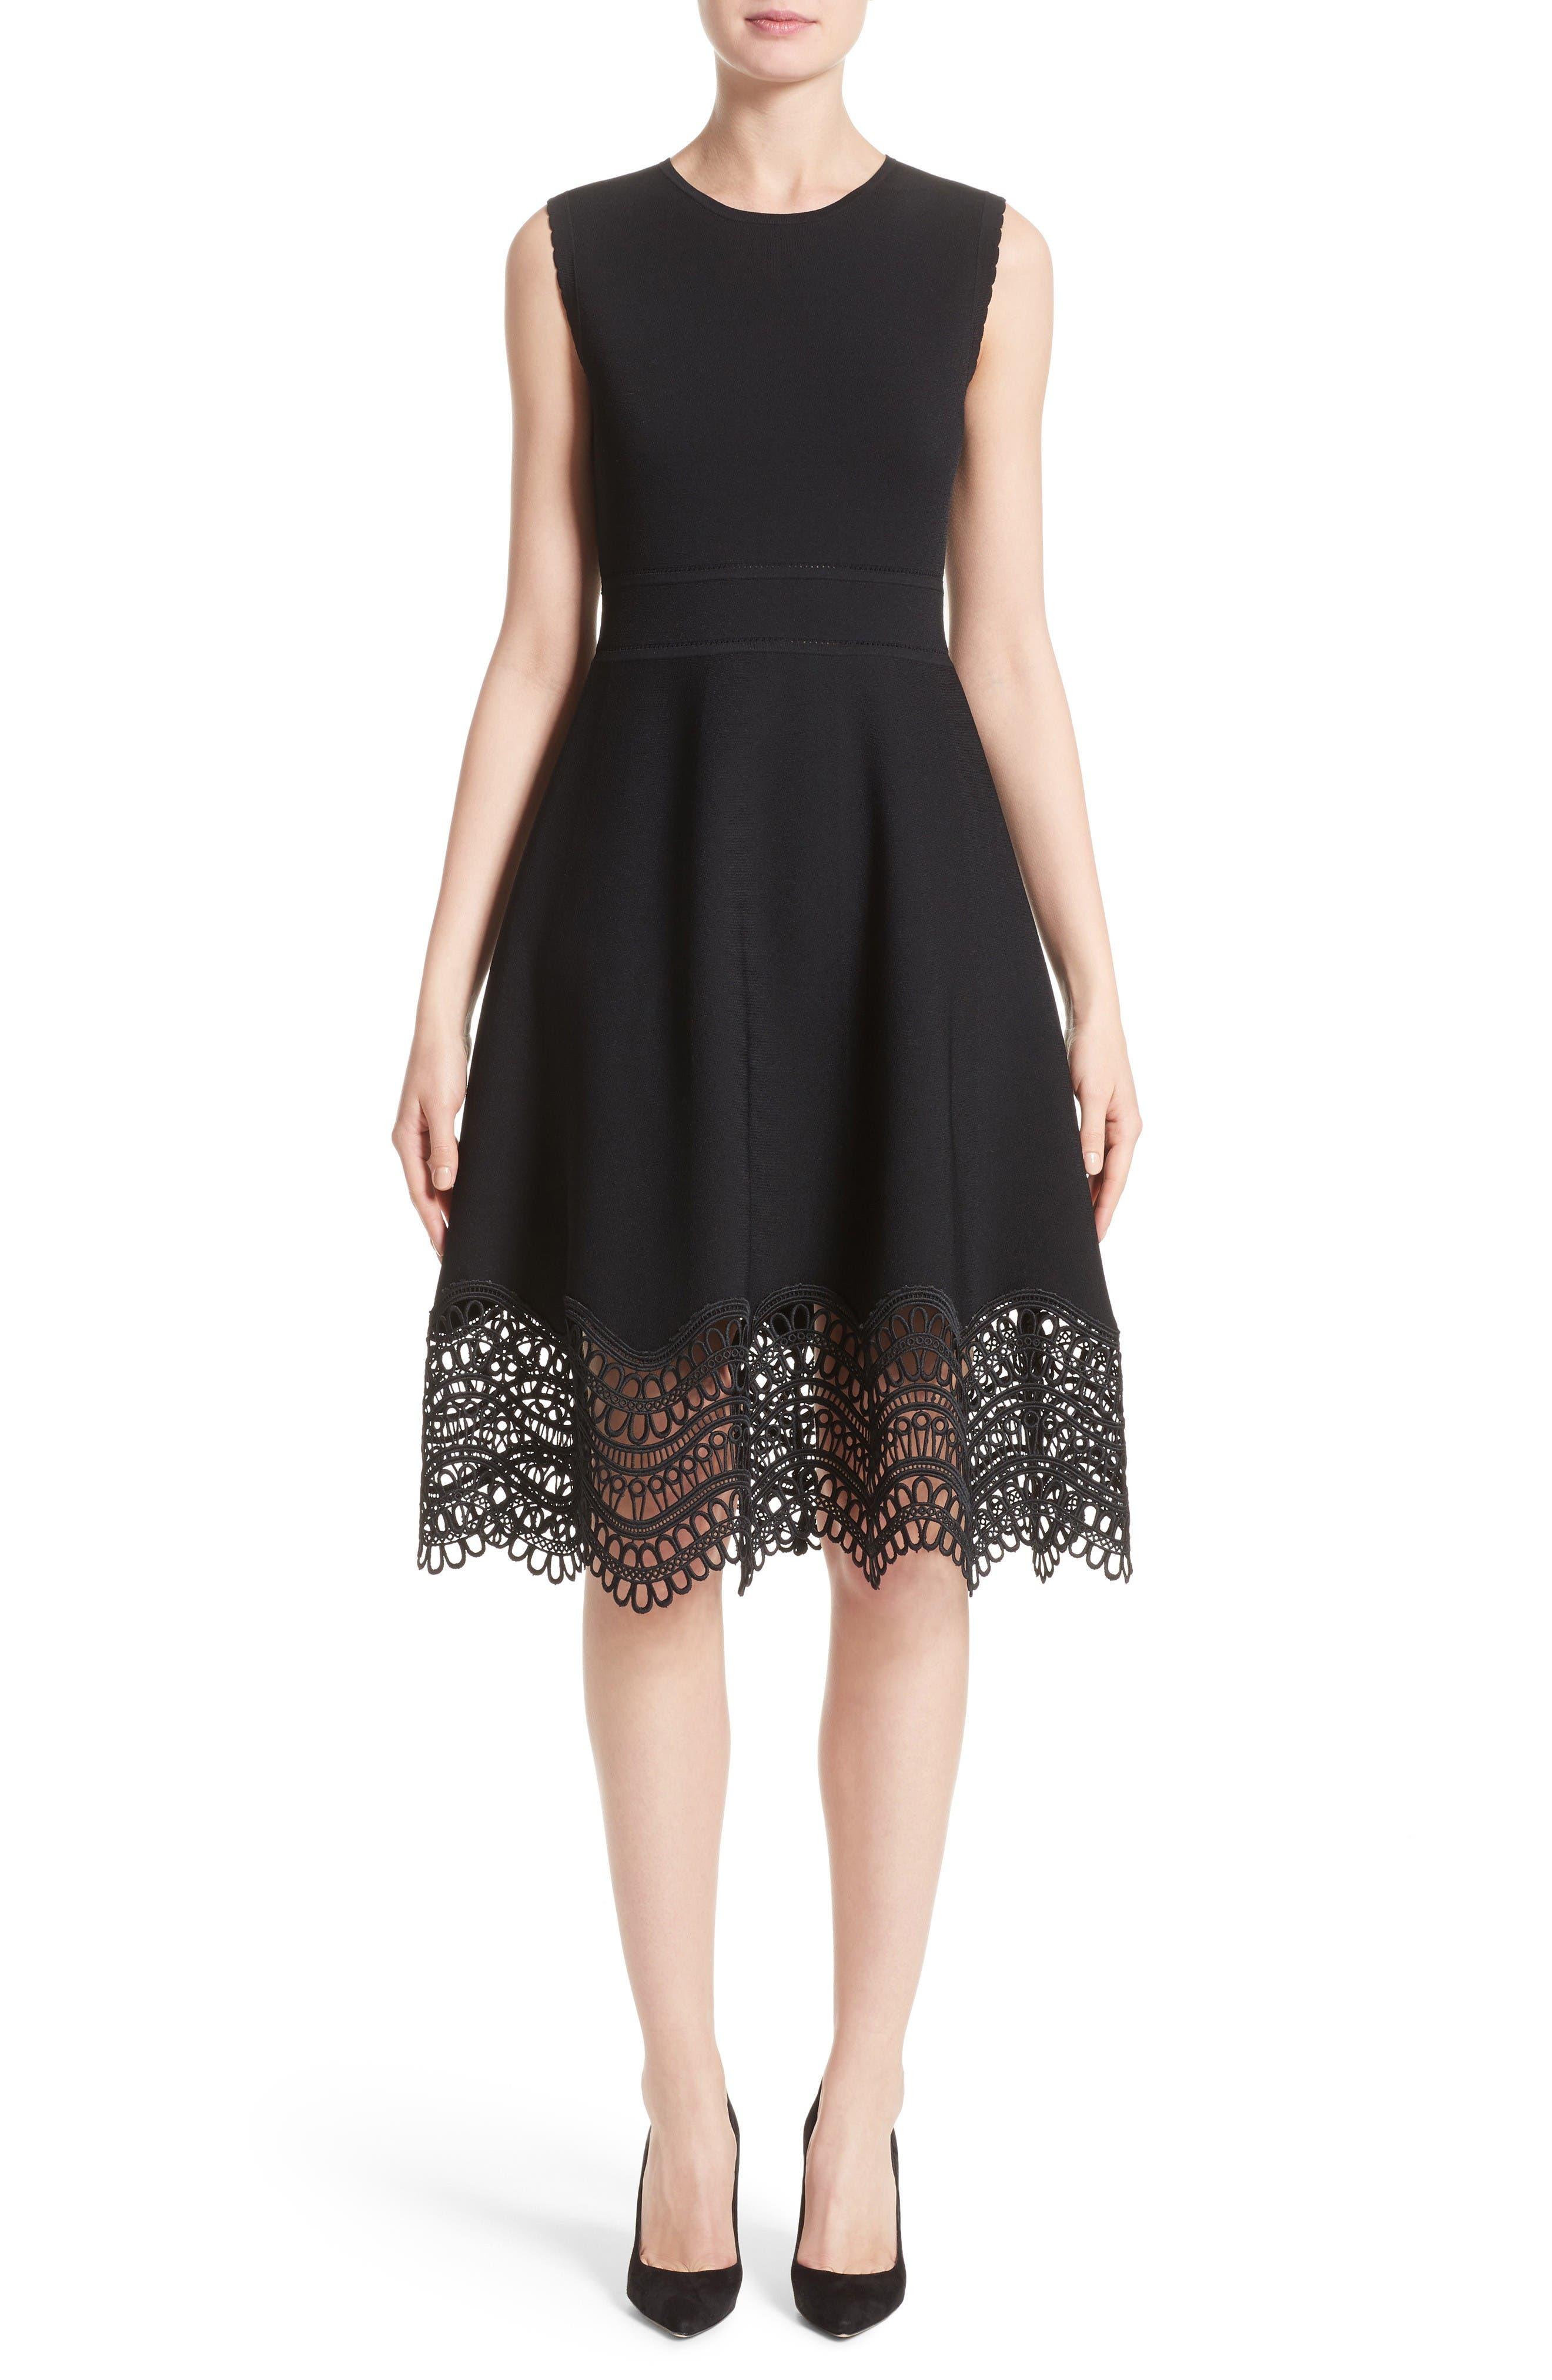 Alternate Image 1 Selected - Lela Rose Lace Hem Dress